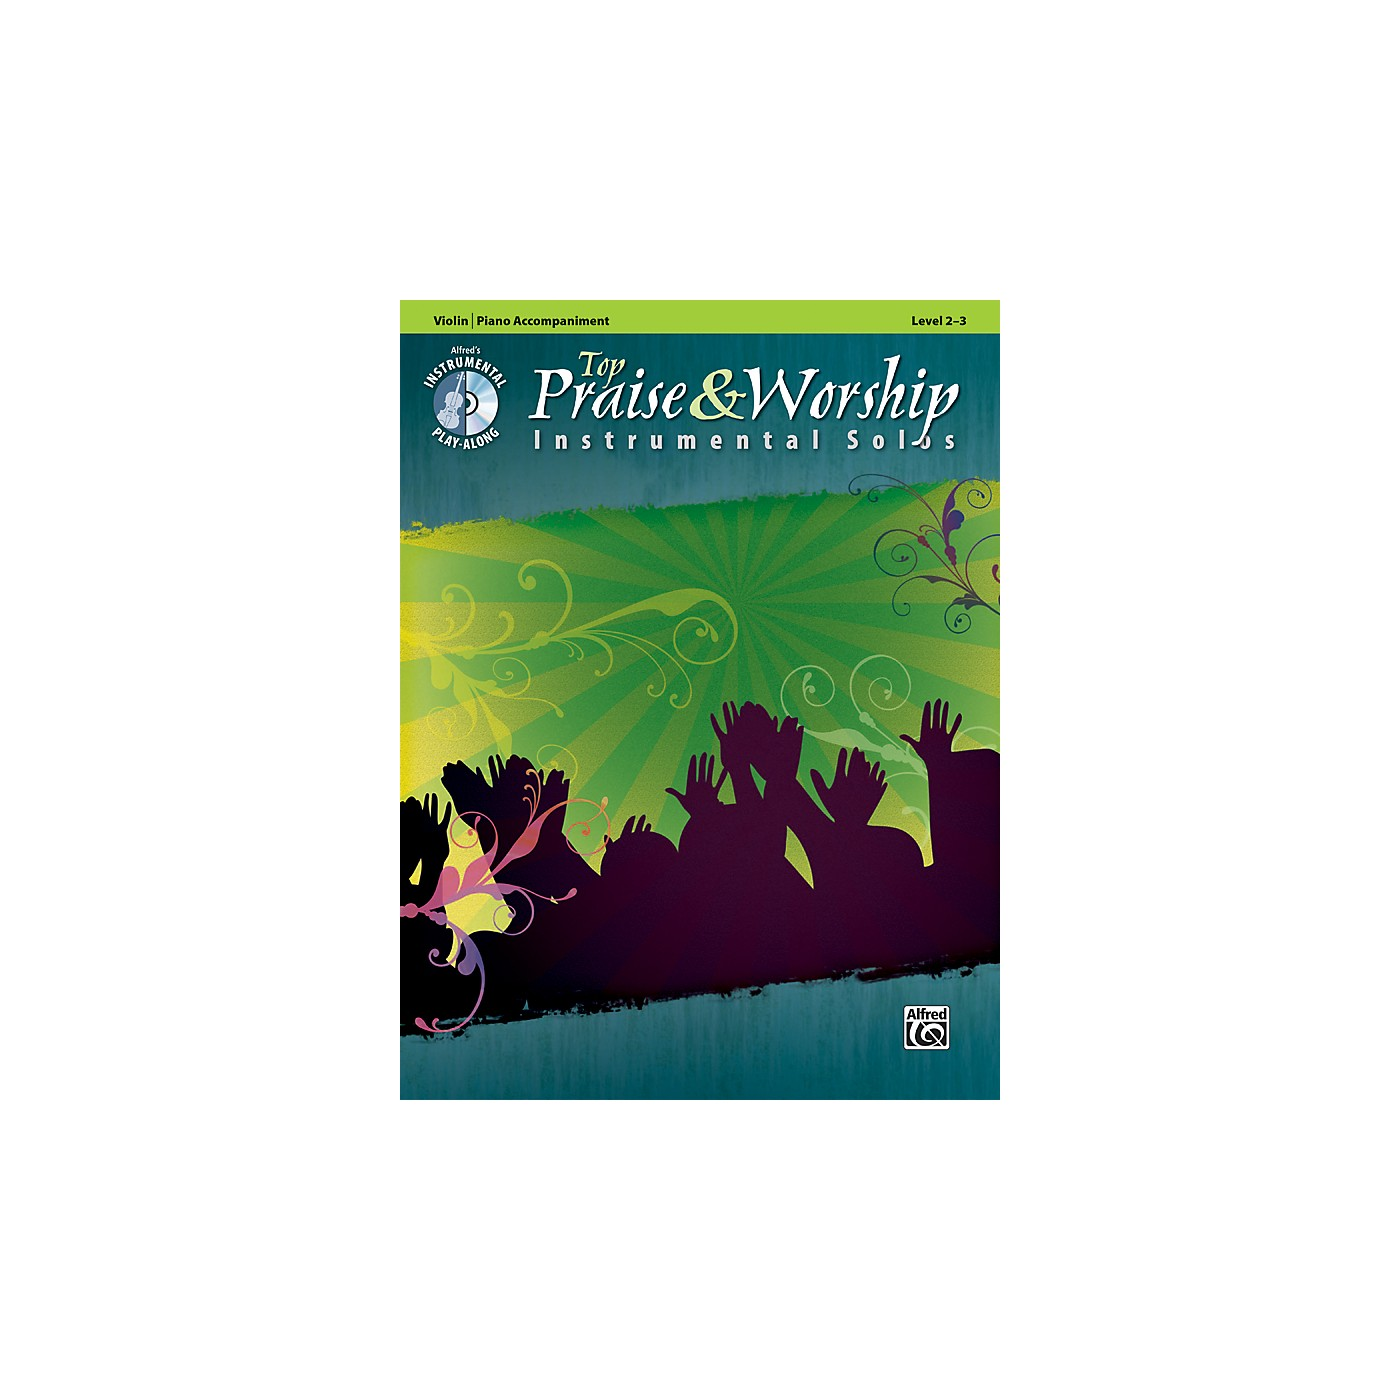 Alfred Top Praise & Worship Instrumental Solos - Violin, Level 2-3 (Book/CD) thumbnail